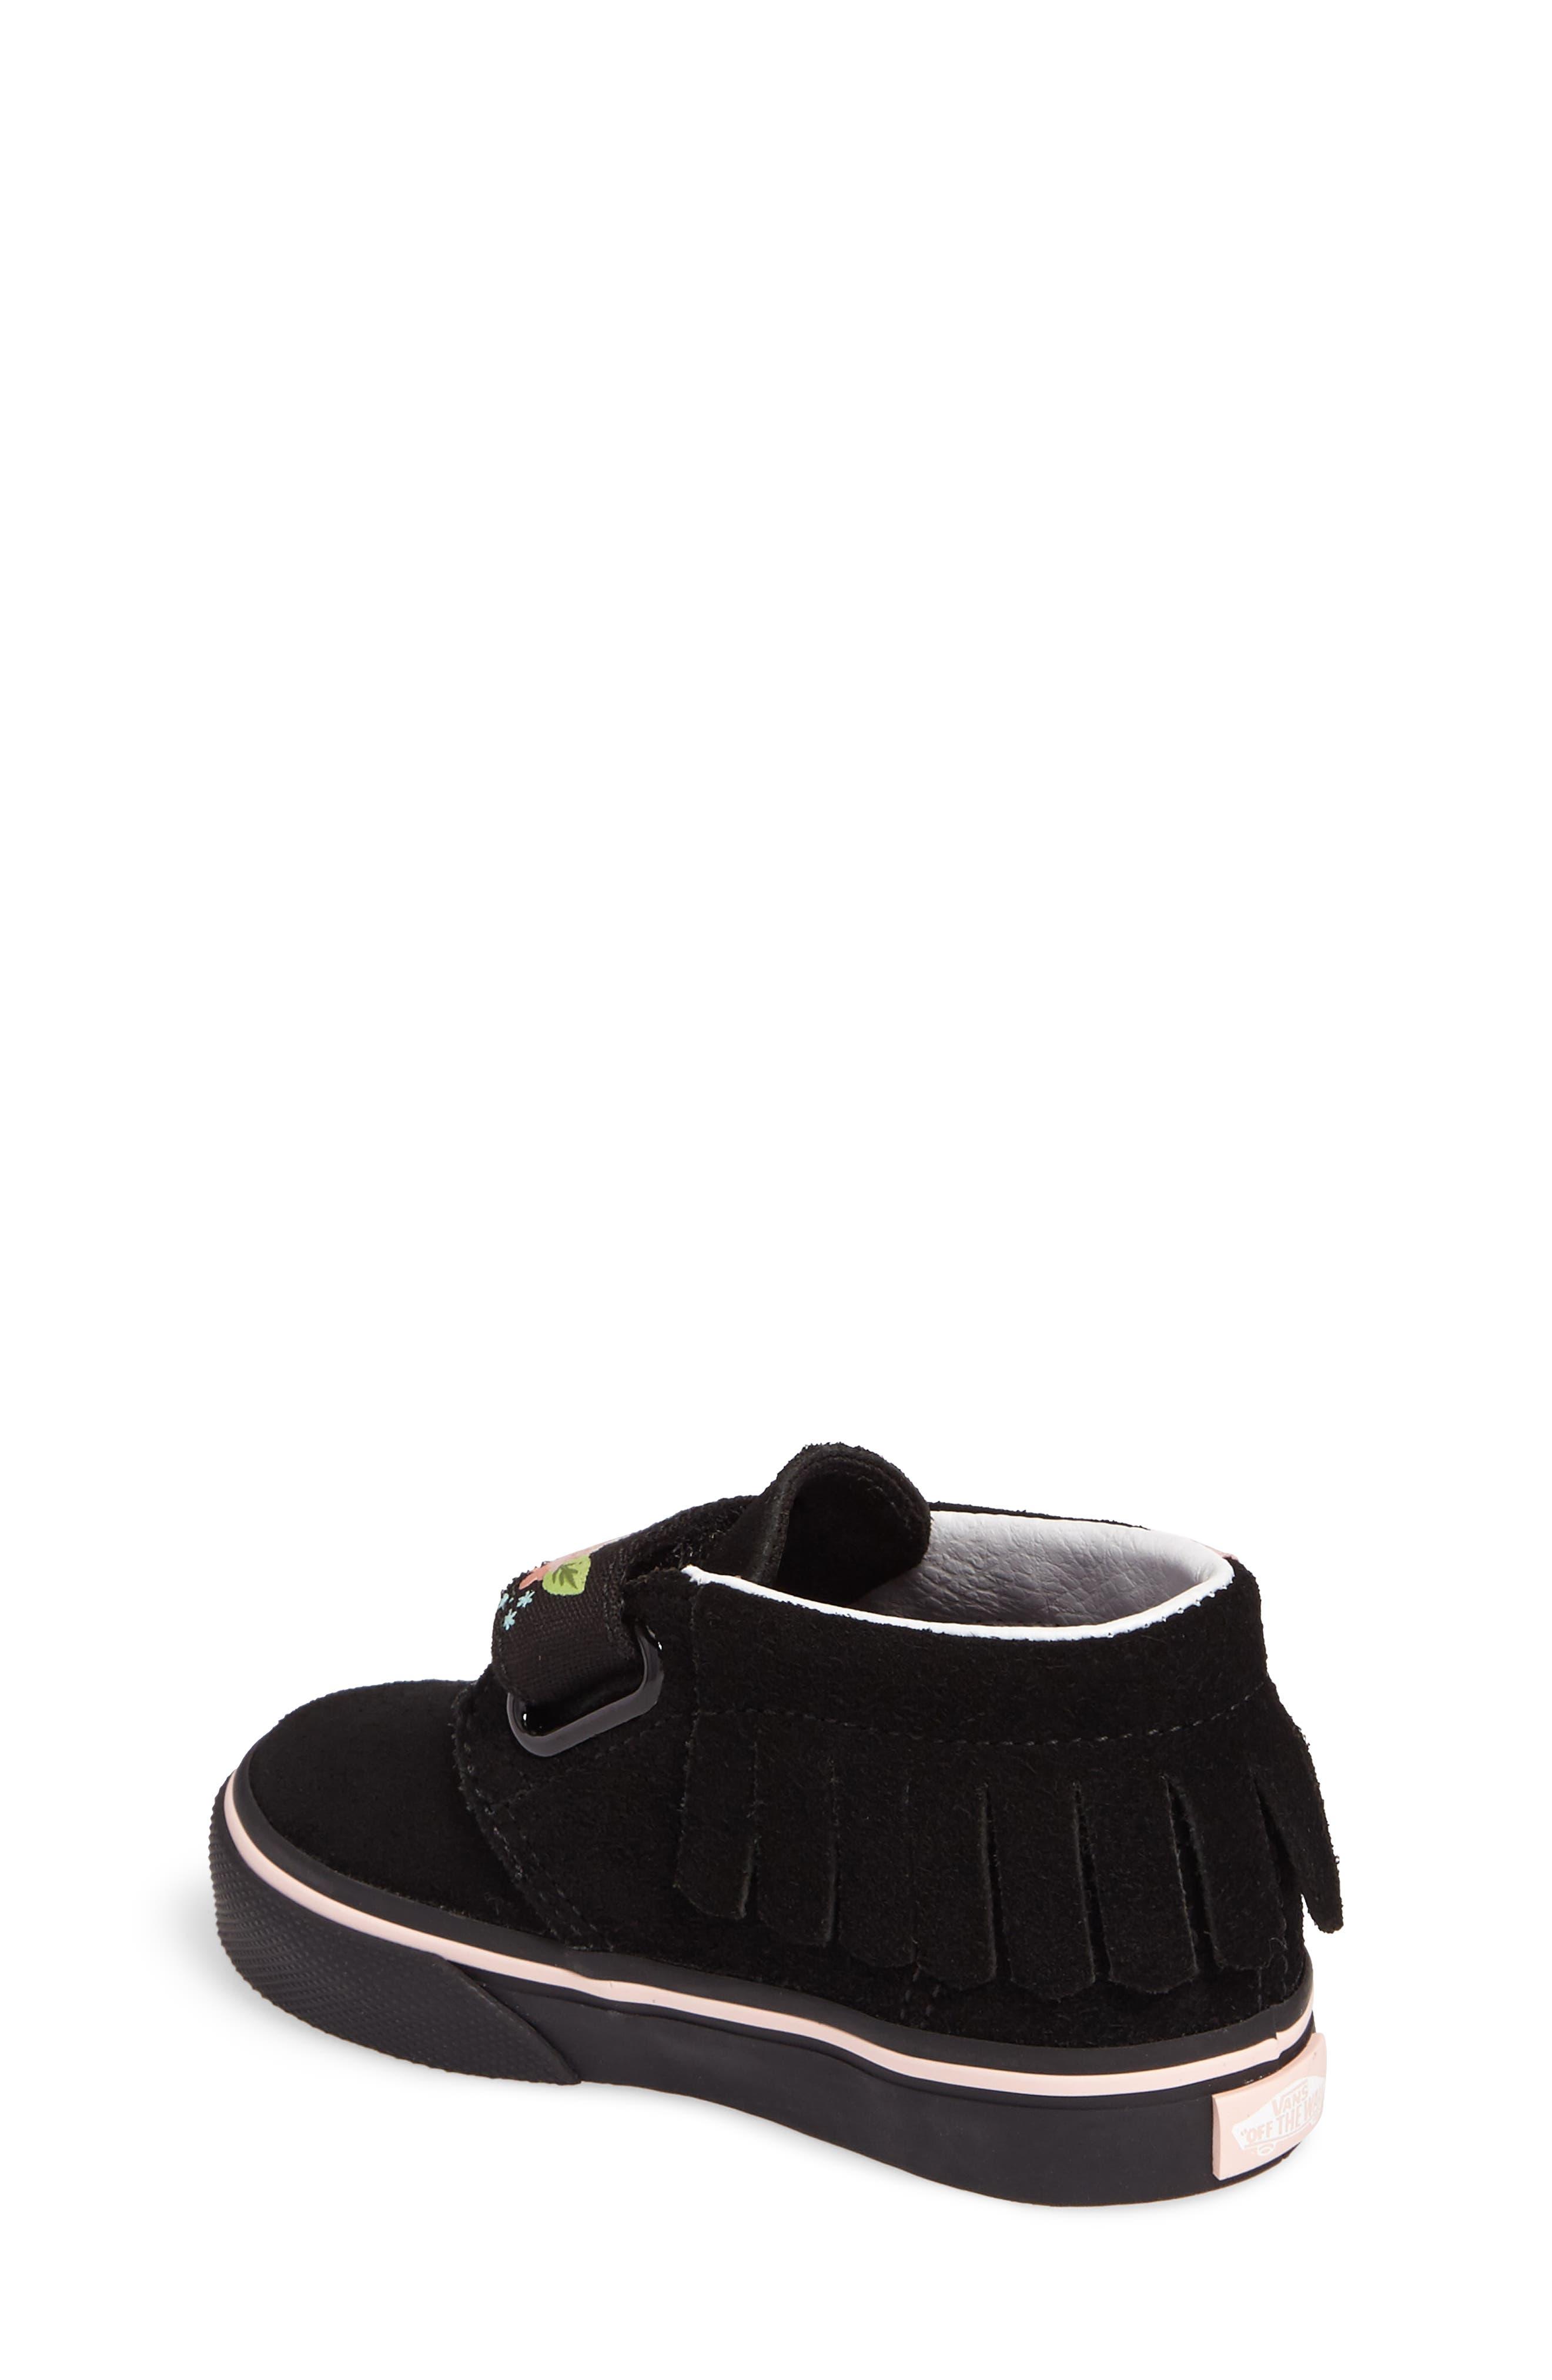 Chukka V Moc Sneaker,                             Alternate thumbnail 2, color,                             001